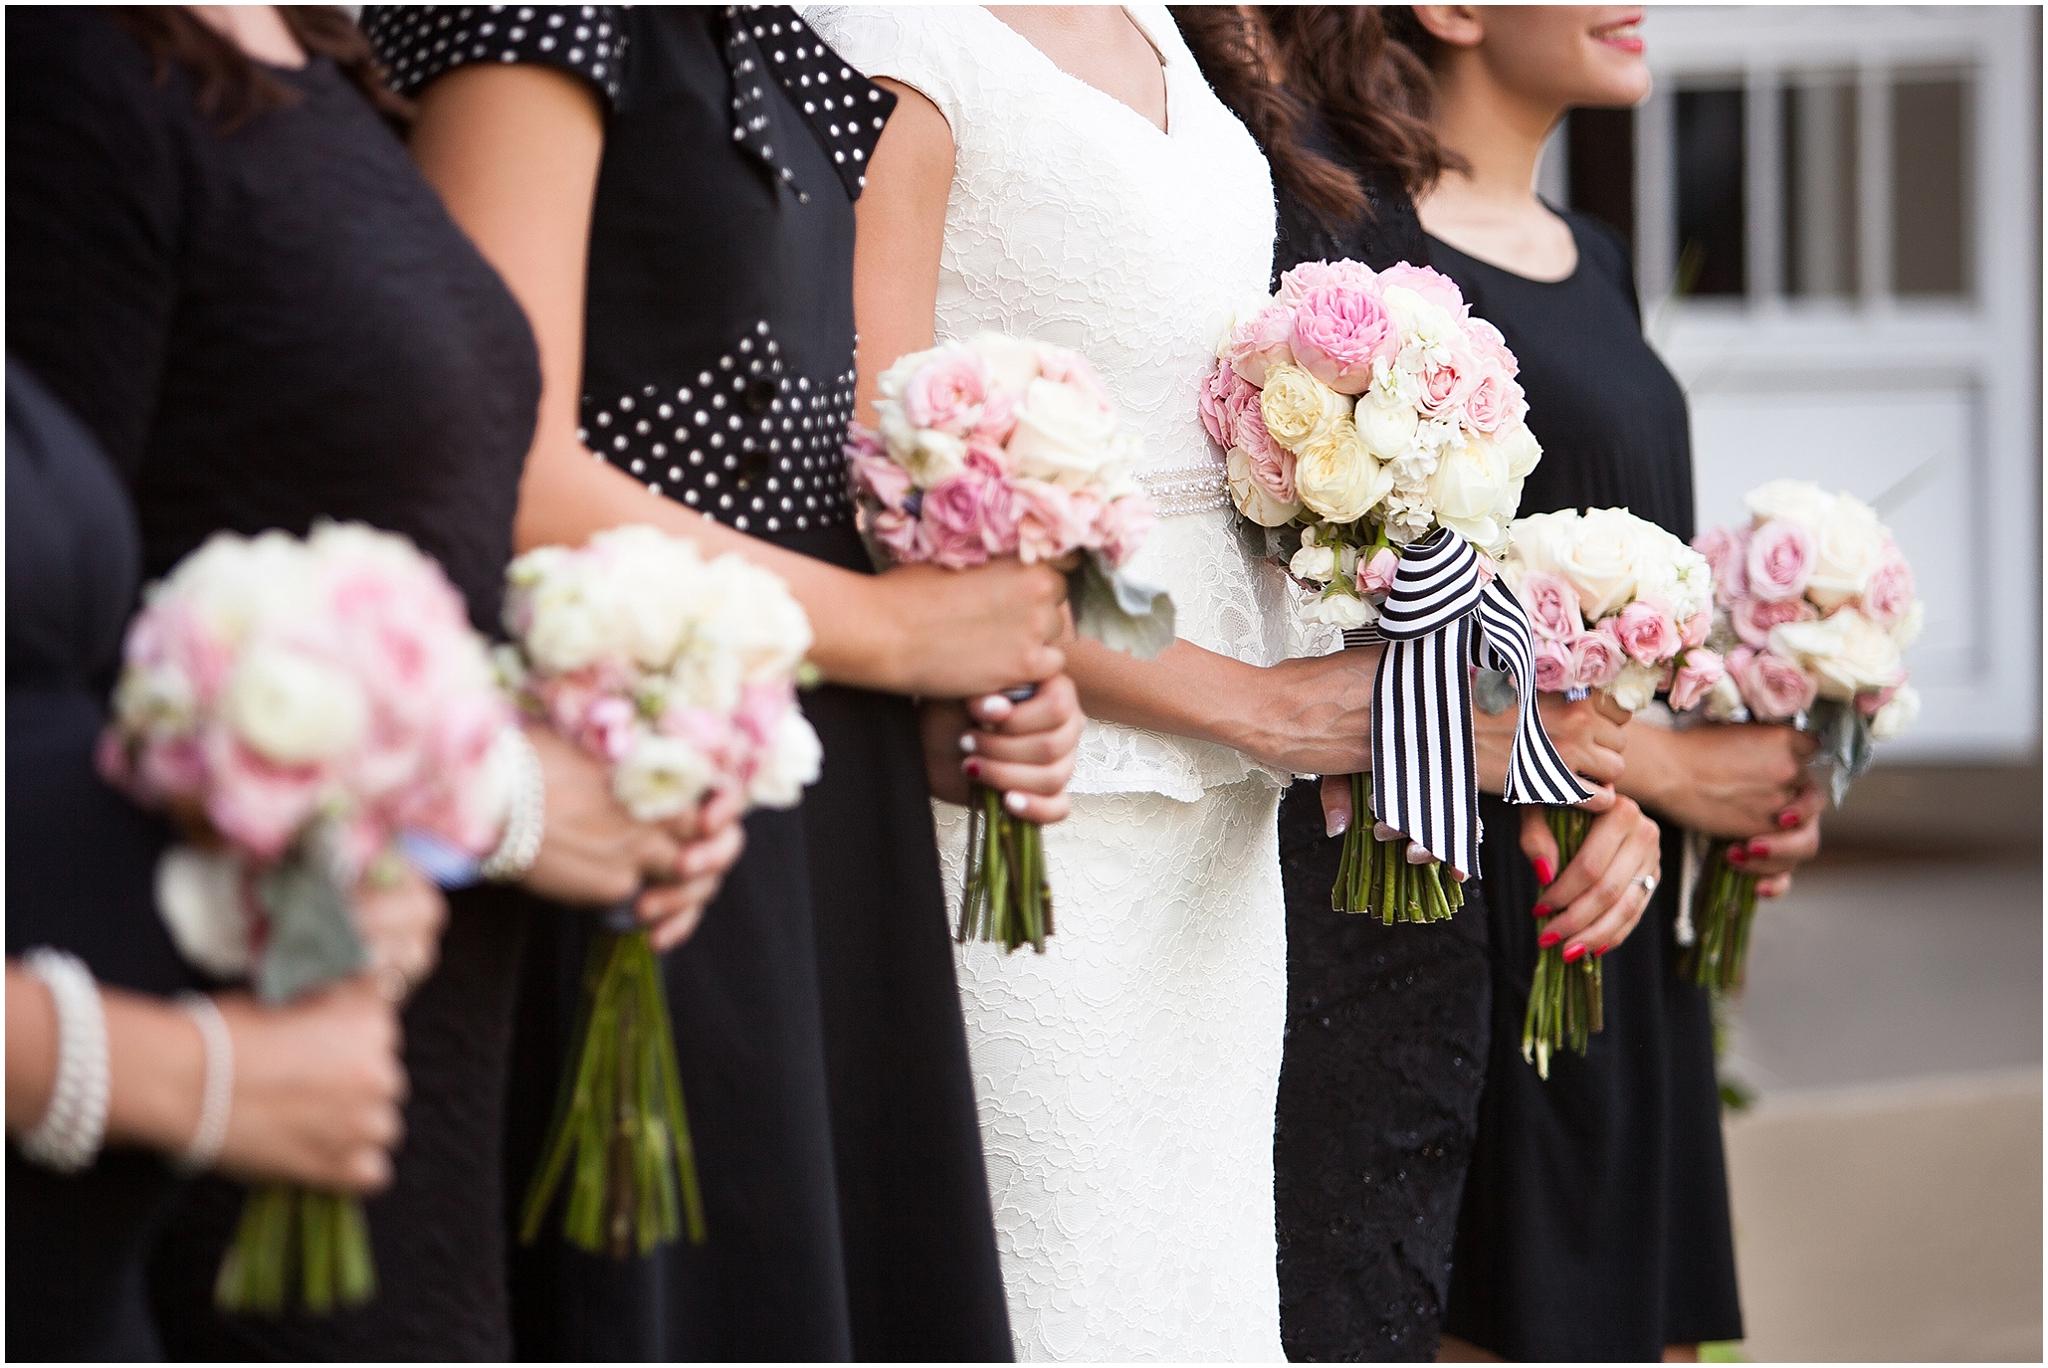 IMG_0119-Edit-103_Lizzie-B-Imagery-Utah-Wedding-Photographer-Salt-Lake-City-Park-City-timpanogos-Utah-Temple.jpg